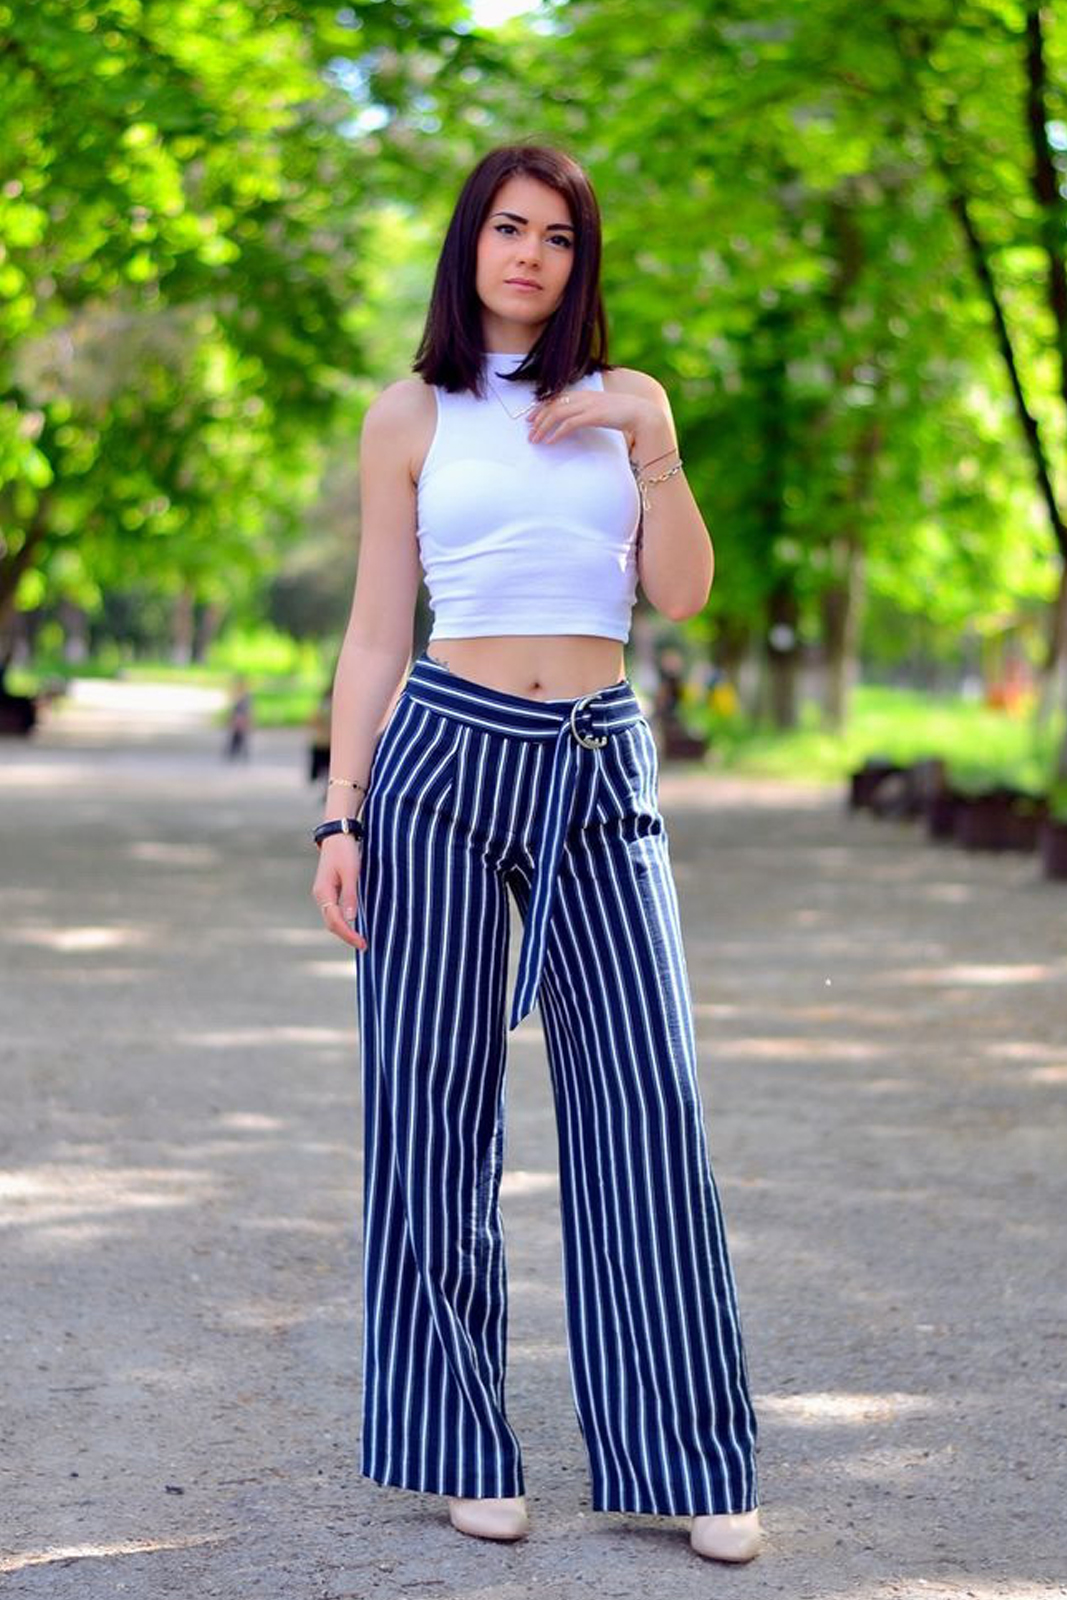 Wajib Punya! Ini 5 Fashion Item yang akan Membuatmu Semakin Stylish Bulan Ini!